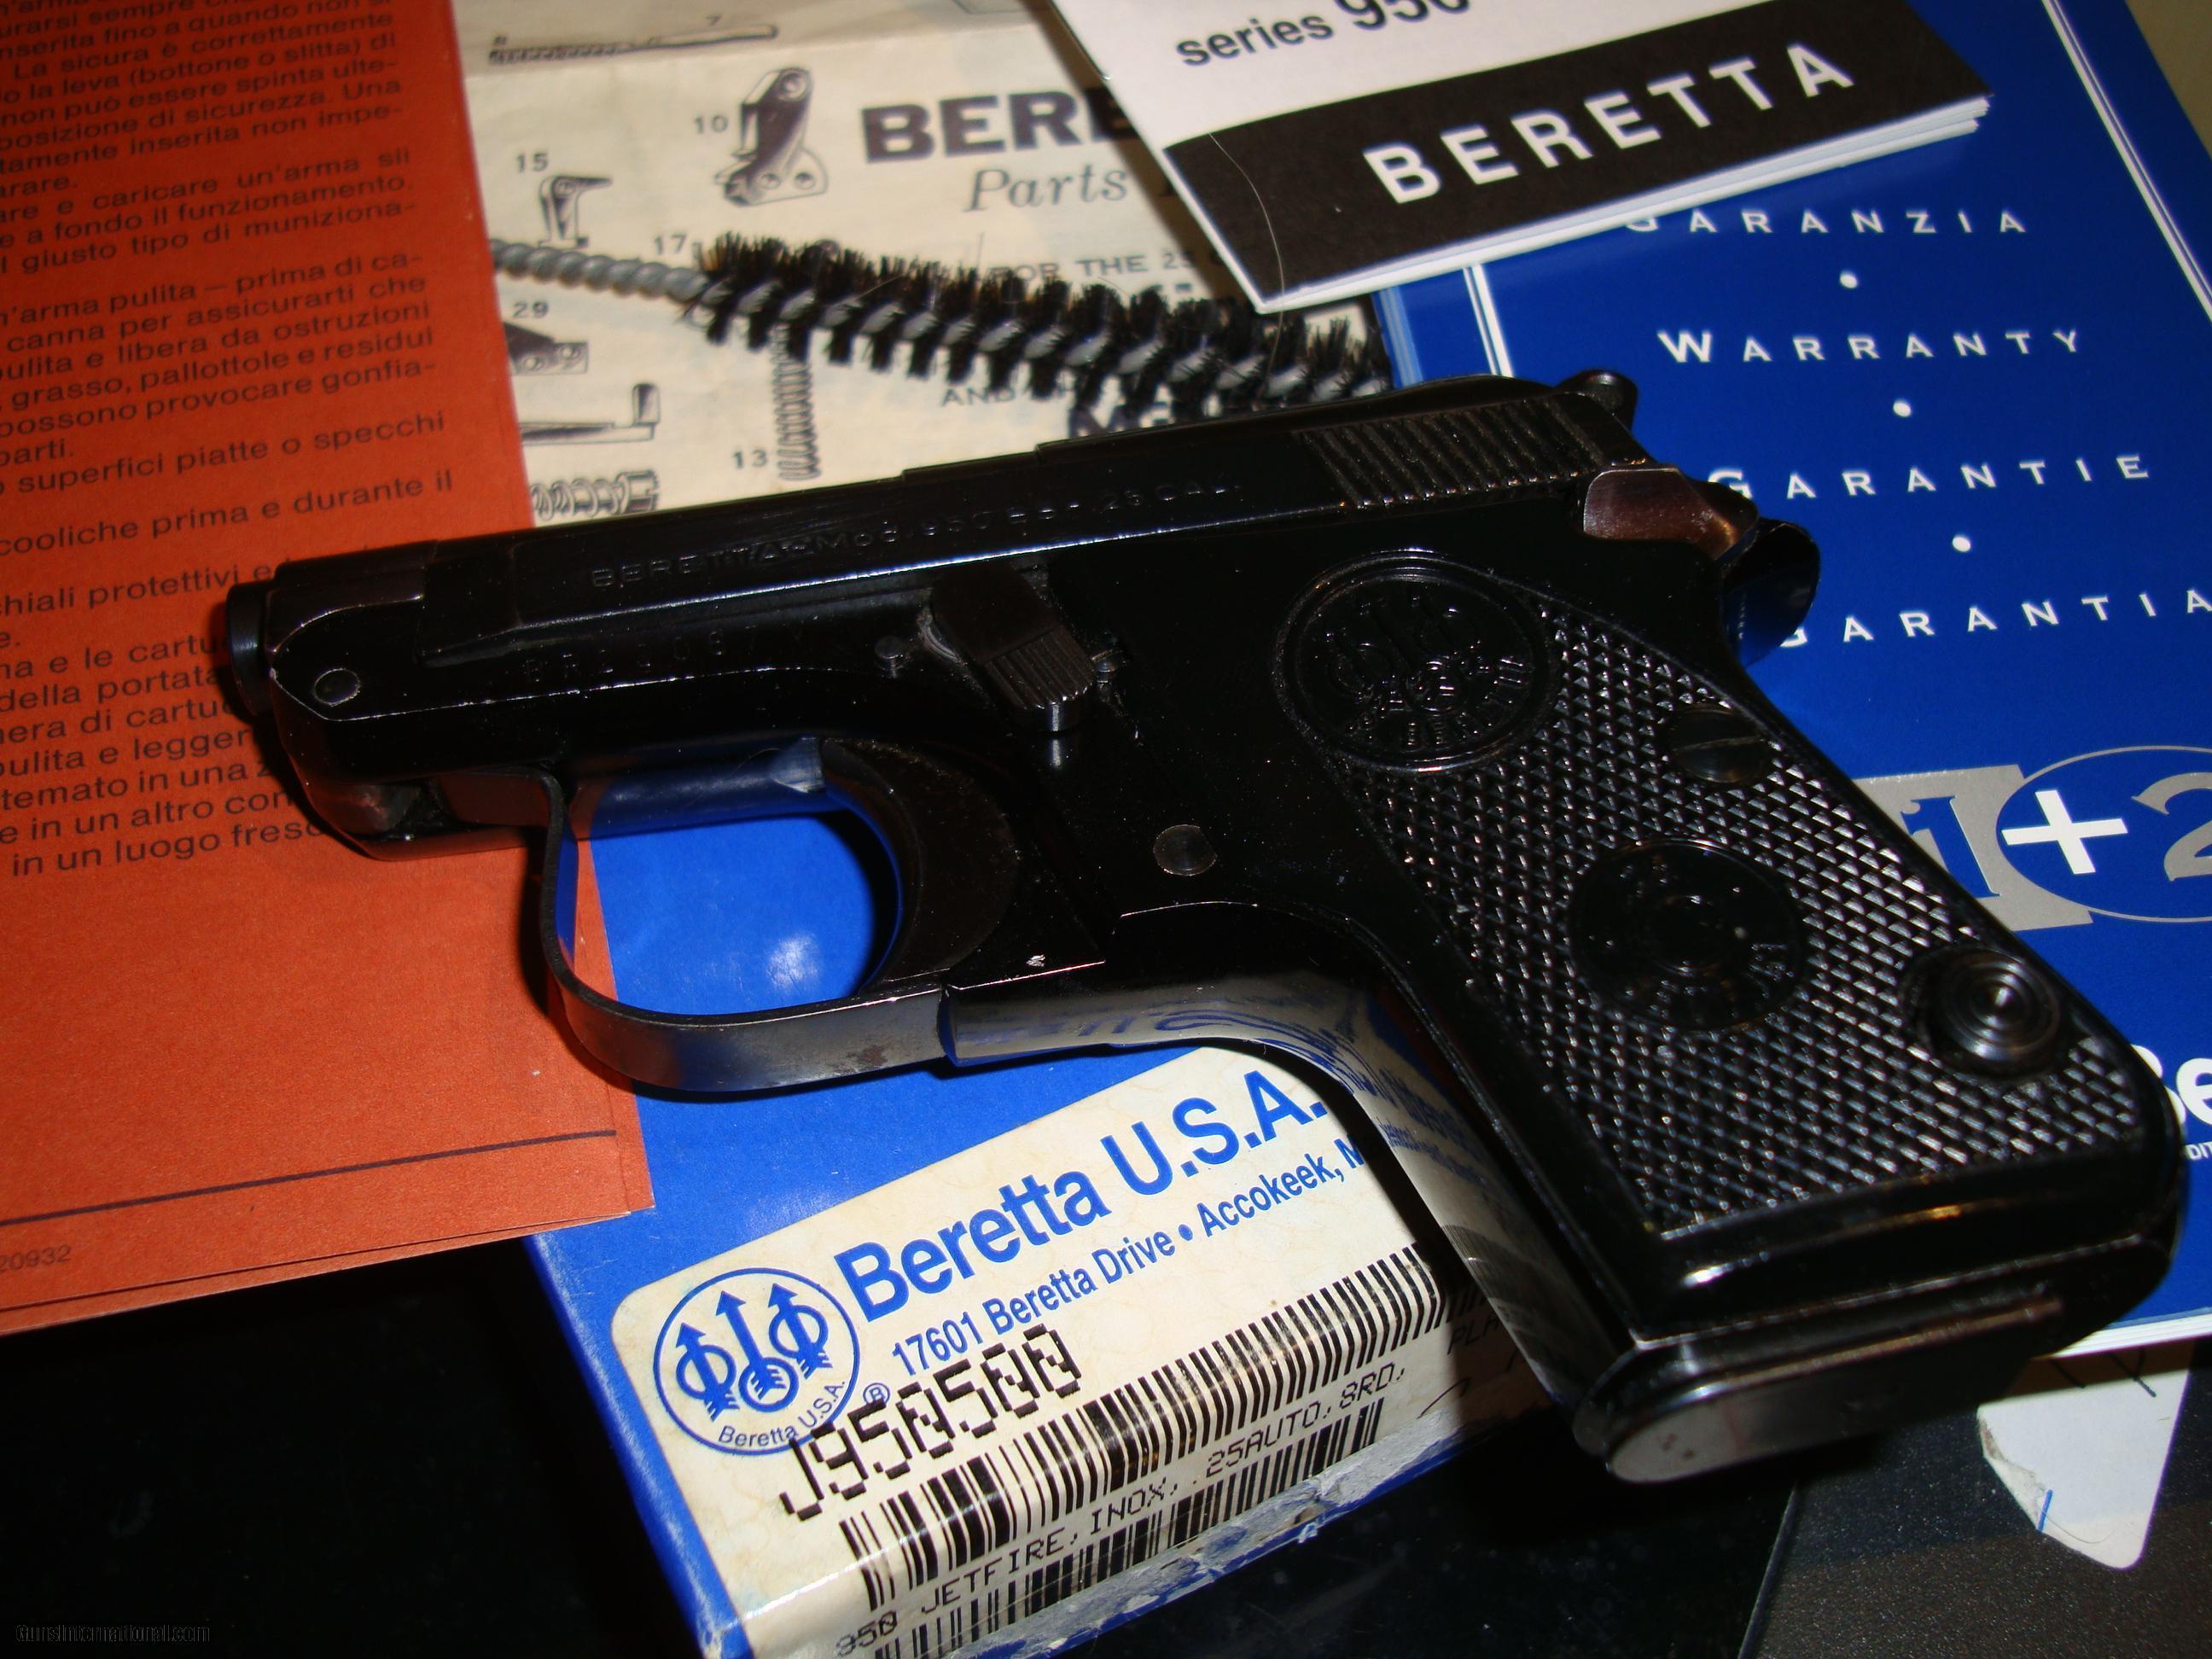 Beretta model 950 serial numbers   Warranty & Serial Number